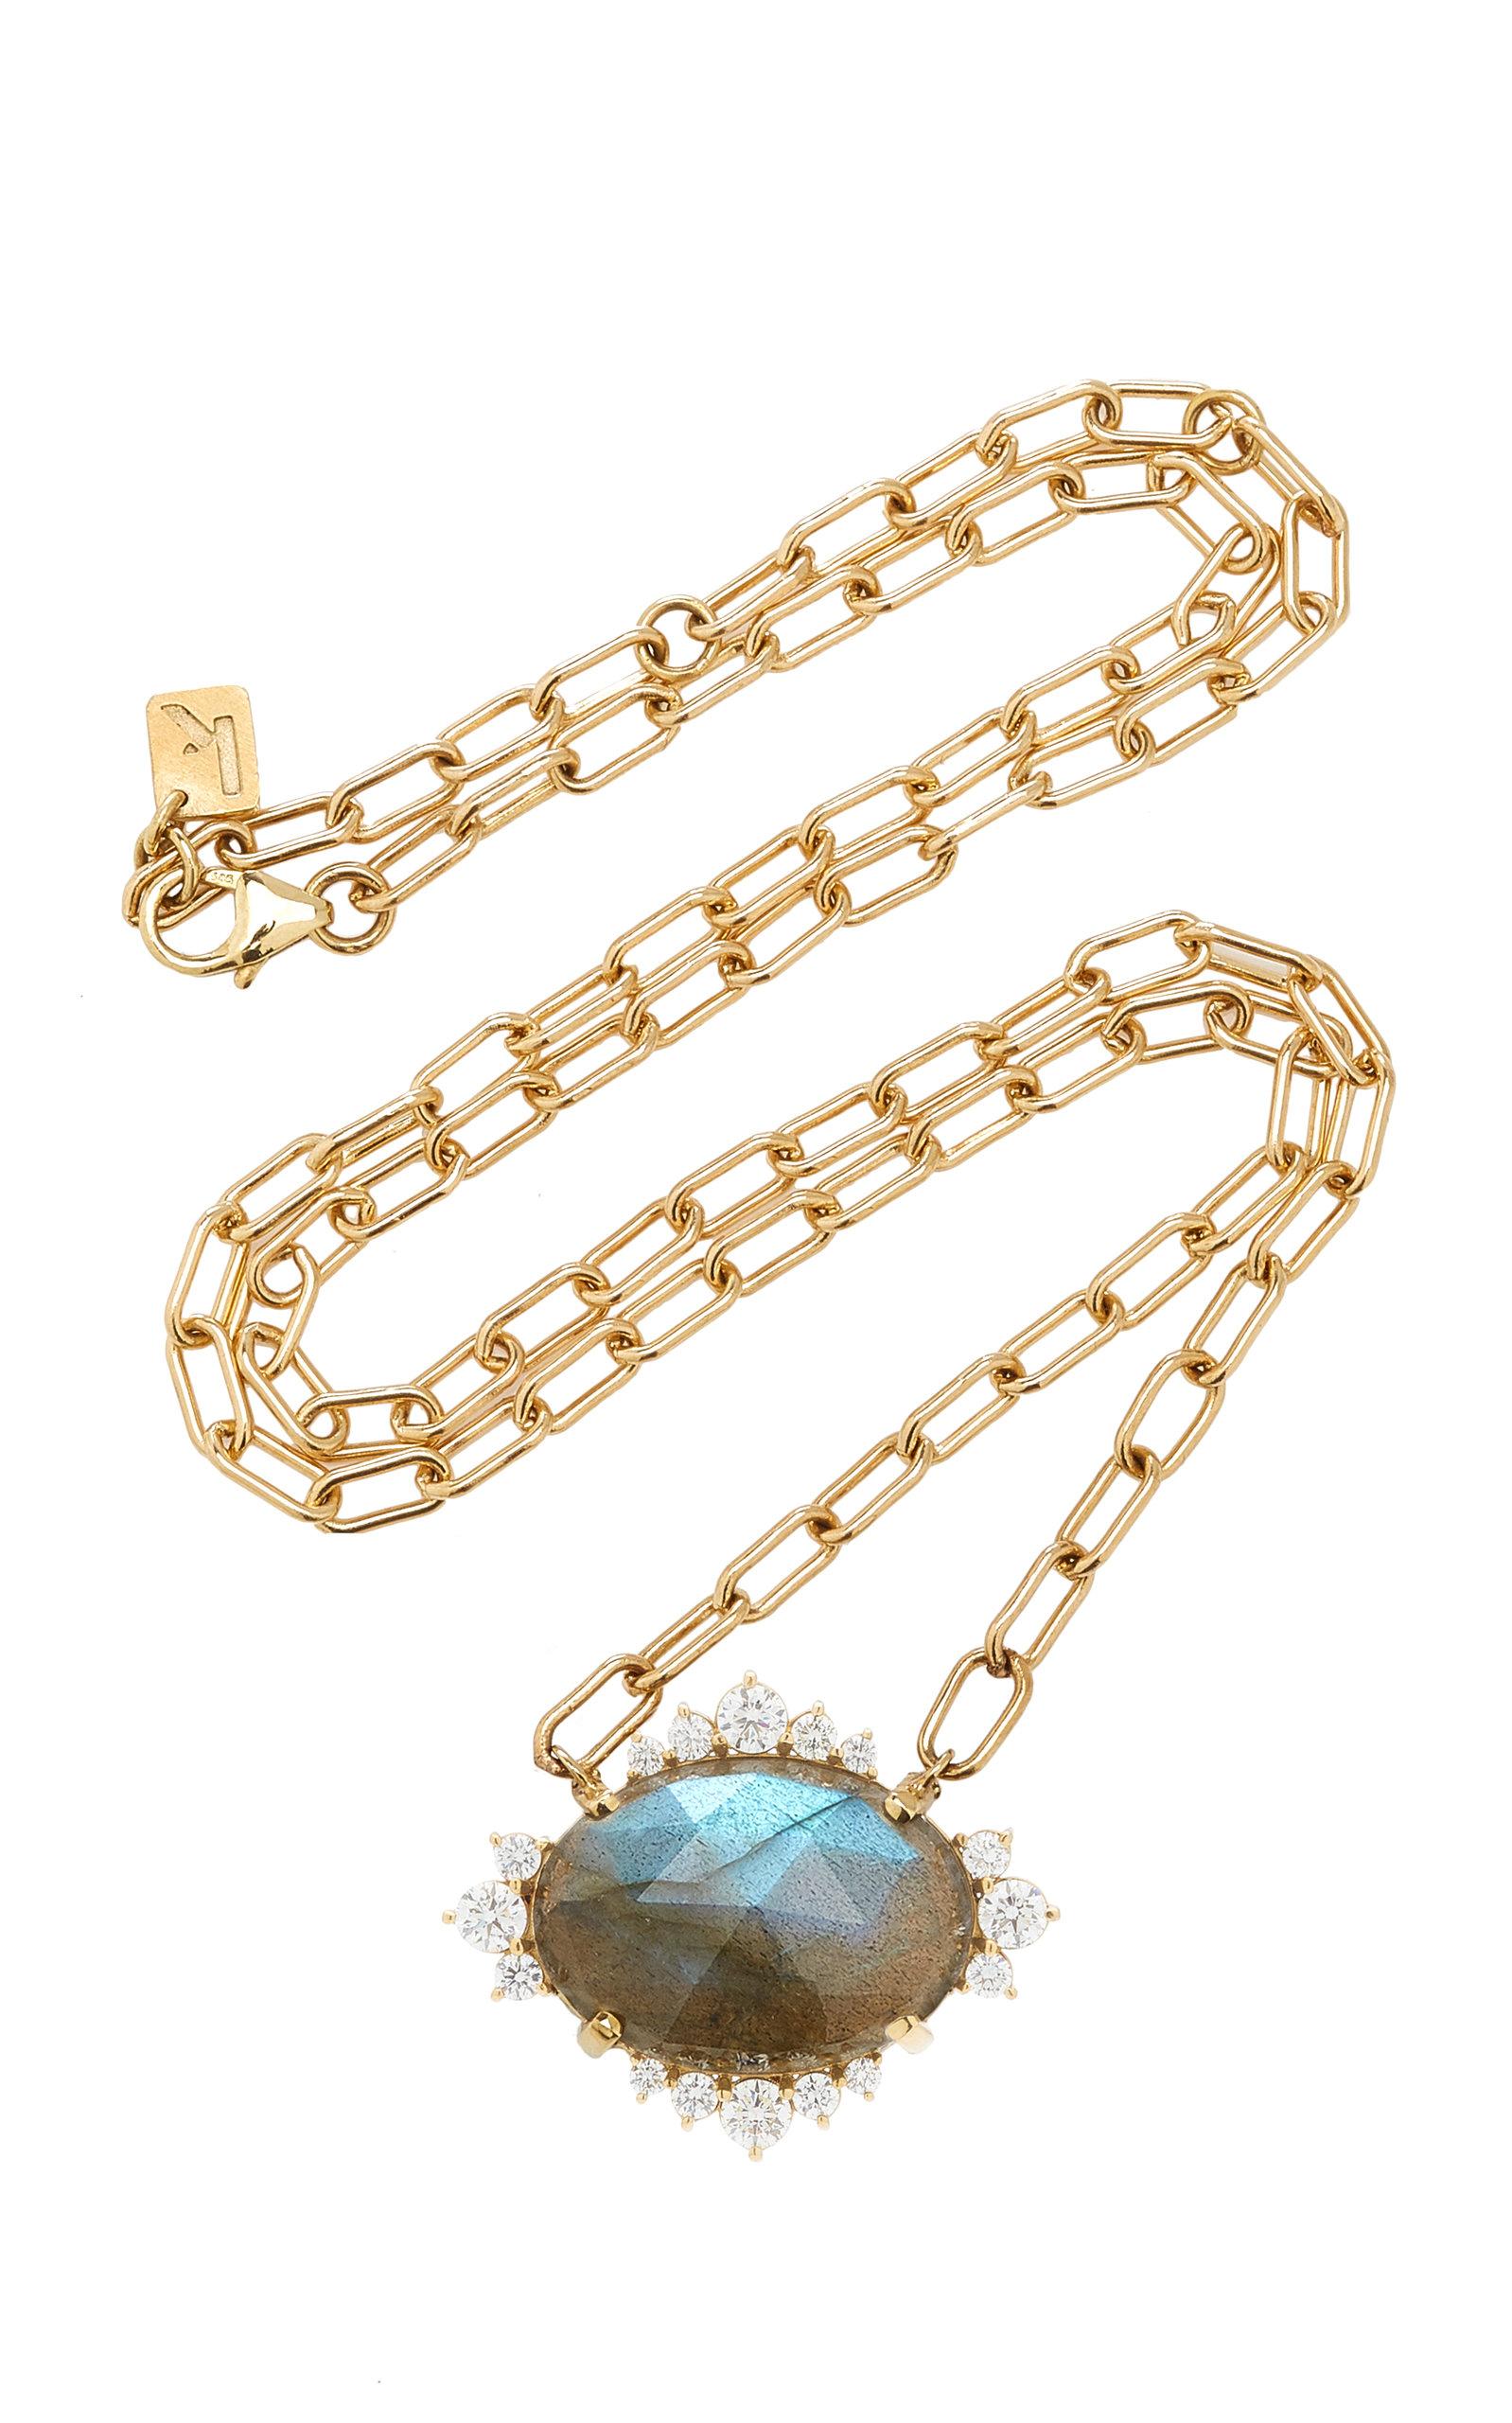 Women's Halo 14K Yellow Gold Labradorite and Diamond Necklace